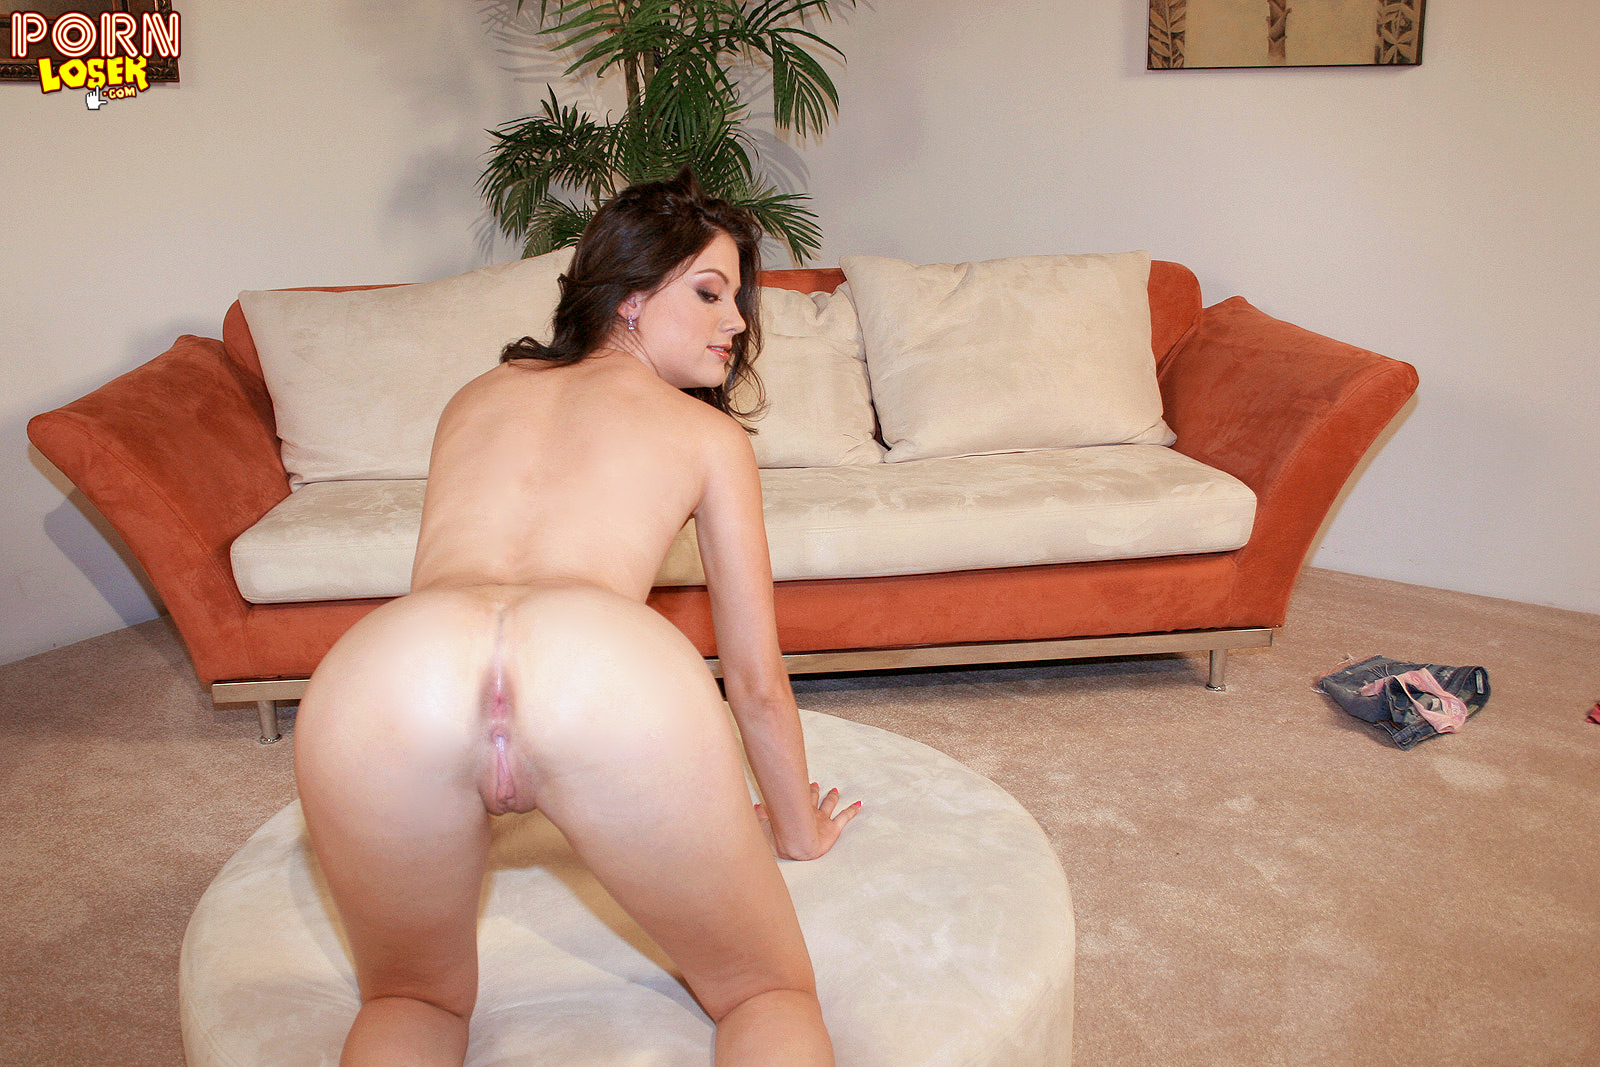 Secretaries in thigh high pantyhose